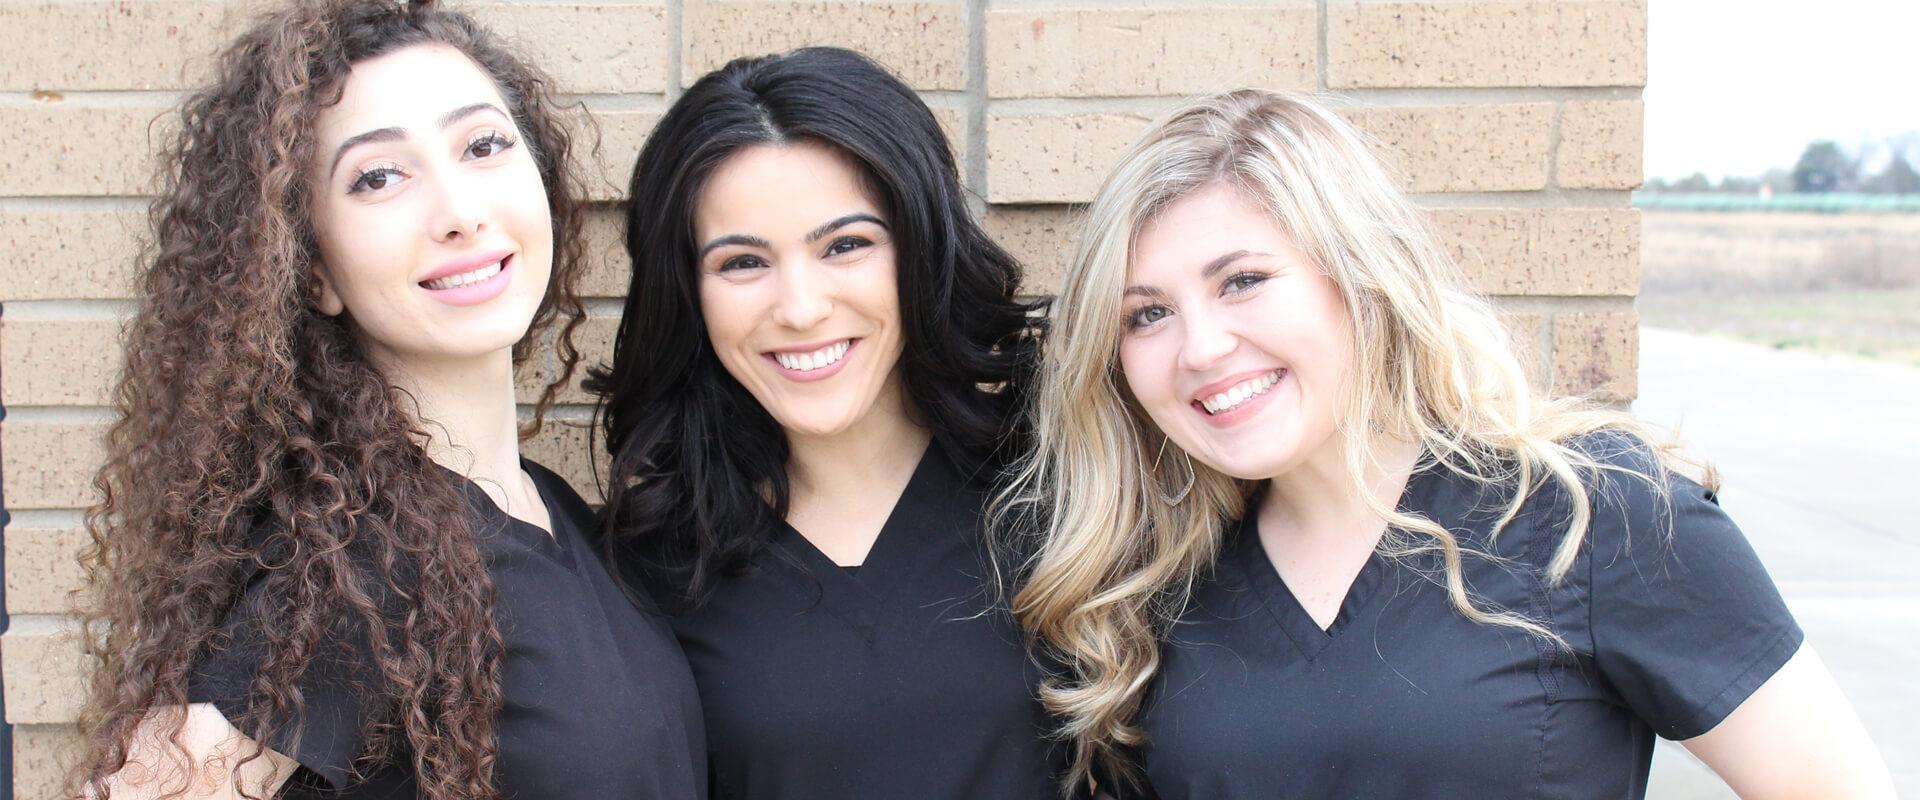 Dentist, Melissa, TX, Dr. Sanjay Ramoliya, Dentist Texas, Melissa TX, Melissa Dentistry, Emergency Dentist Melissa tx, dental appointment, dentist Melissa TX, Melissa dentist, dental cleanings, cosmetic dentistry, implants, crowns, teeth whitening, orthodontics, orthodontics TX, melissa orthodontics